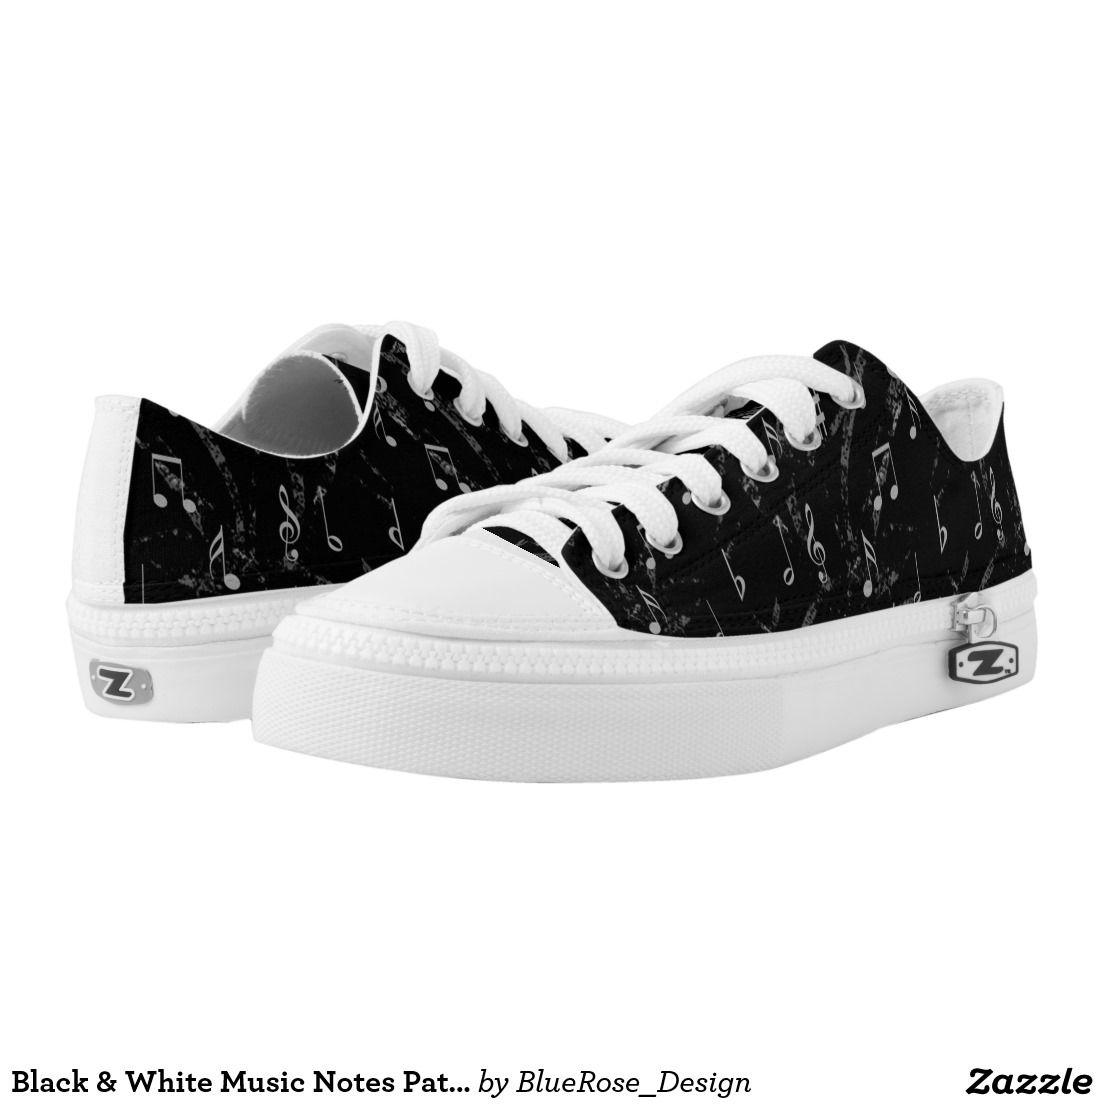 Negro & Blanco Zapatos Music Notes Pattern Unisex Zapatos Blanco Printed Zapatos | Zapatos aa1bc6